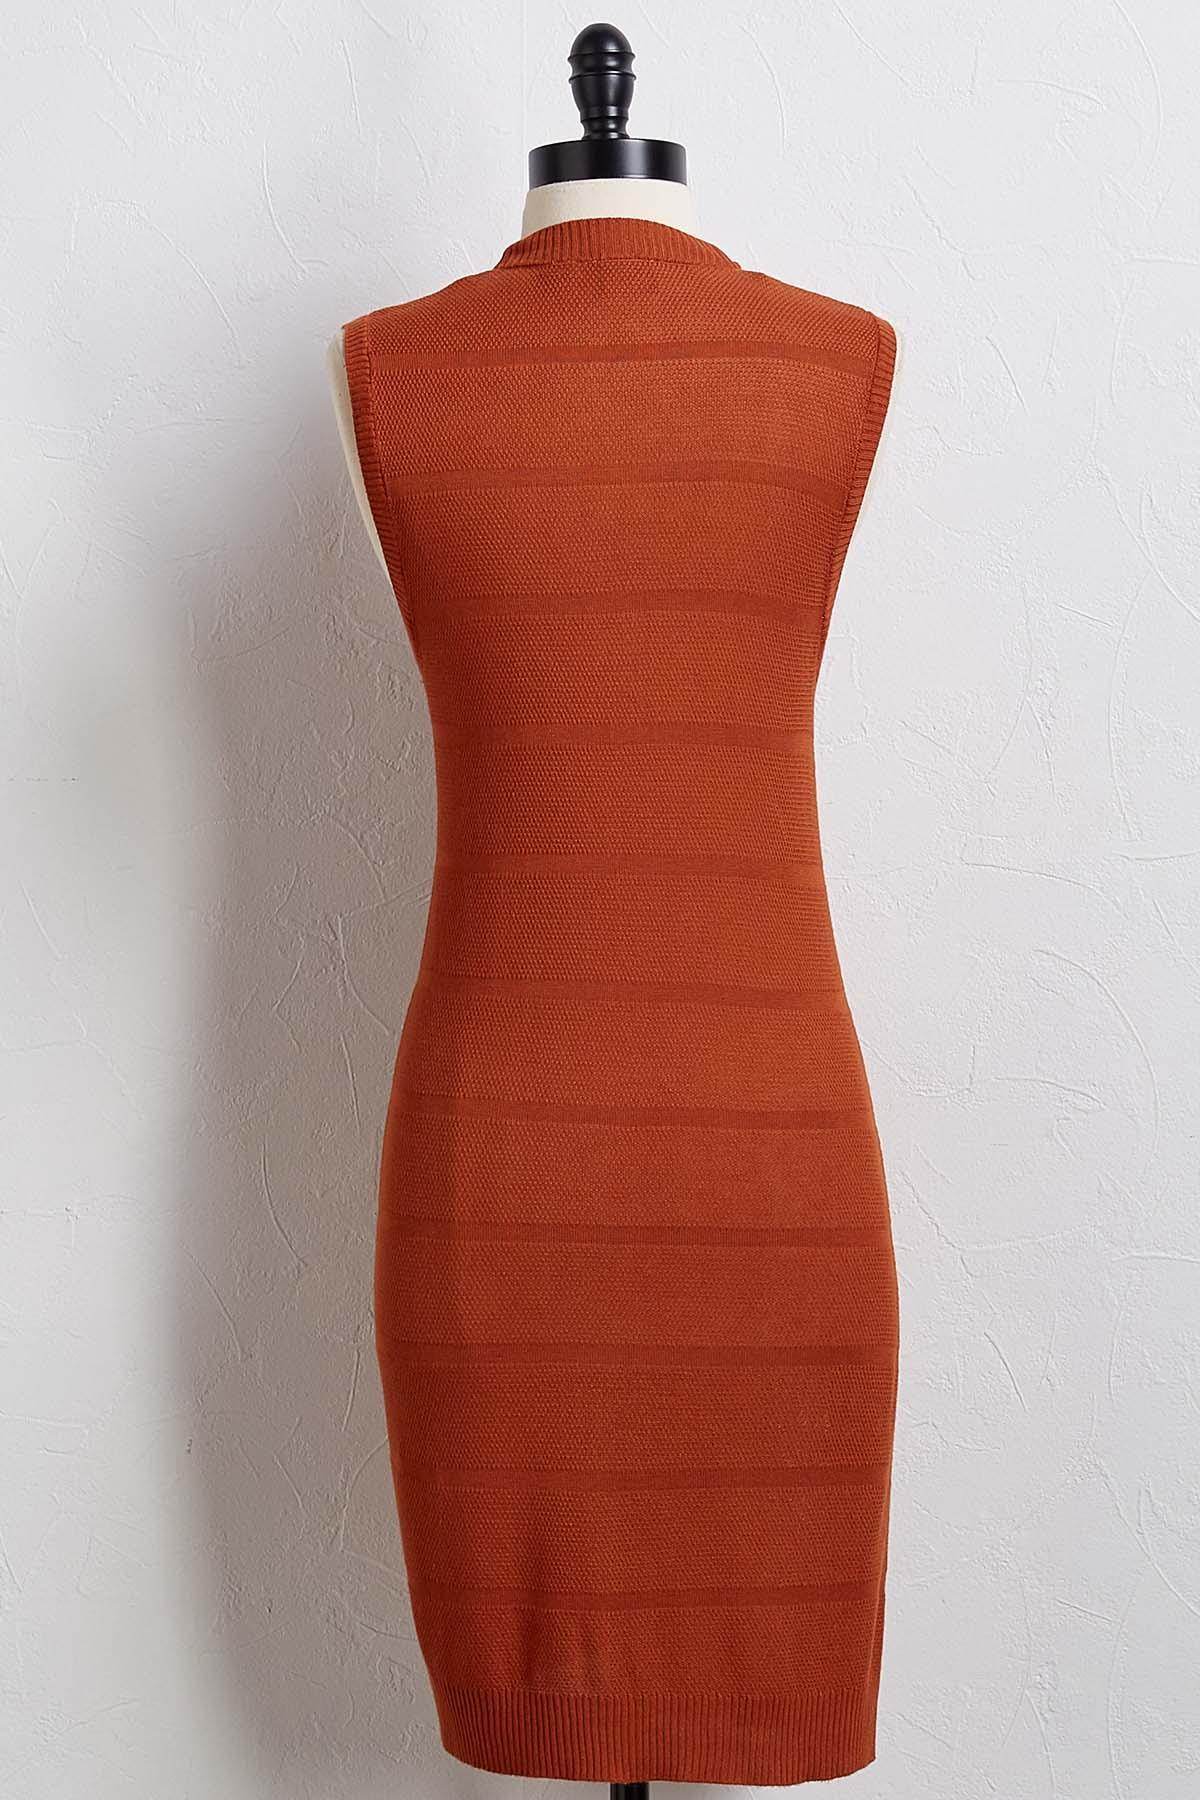 Orange You Cute Vest